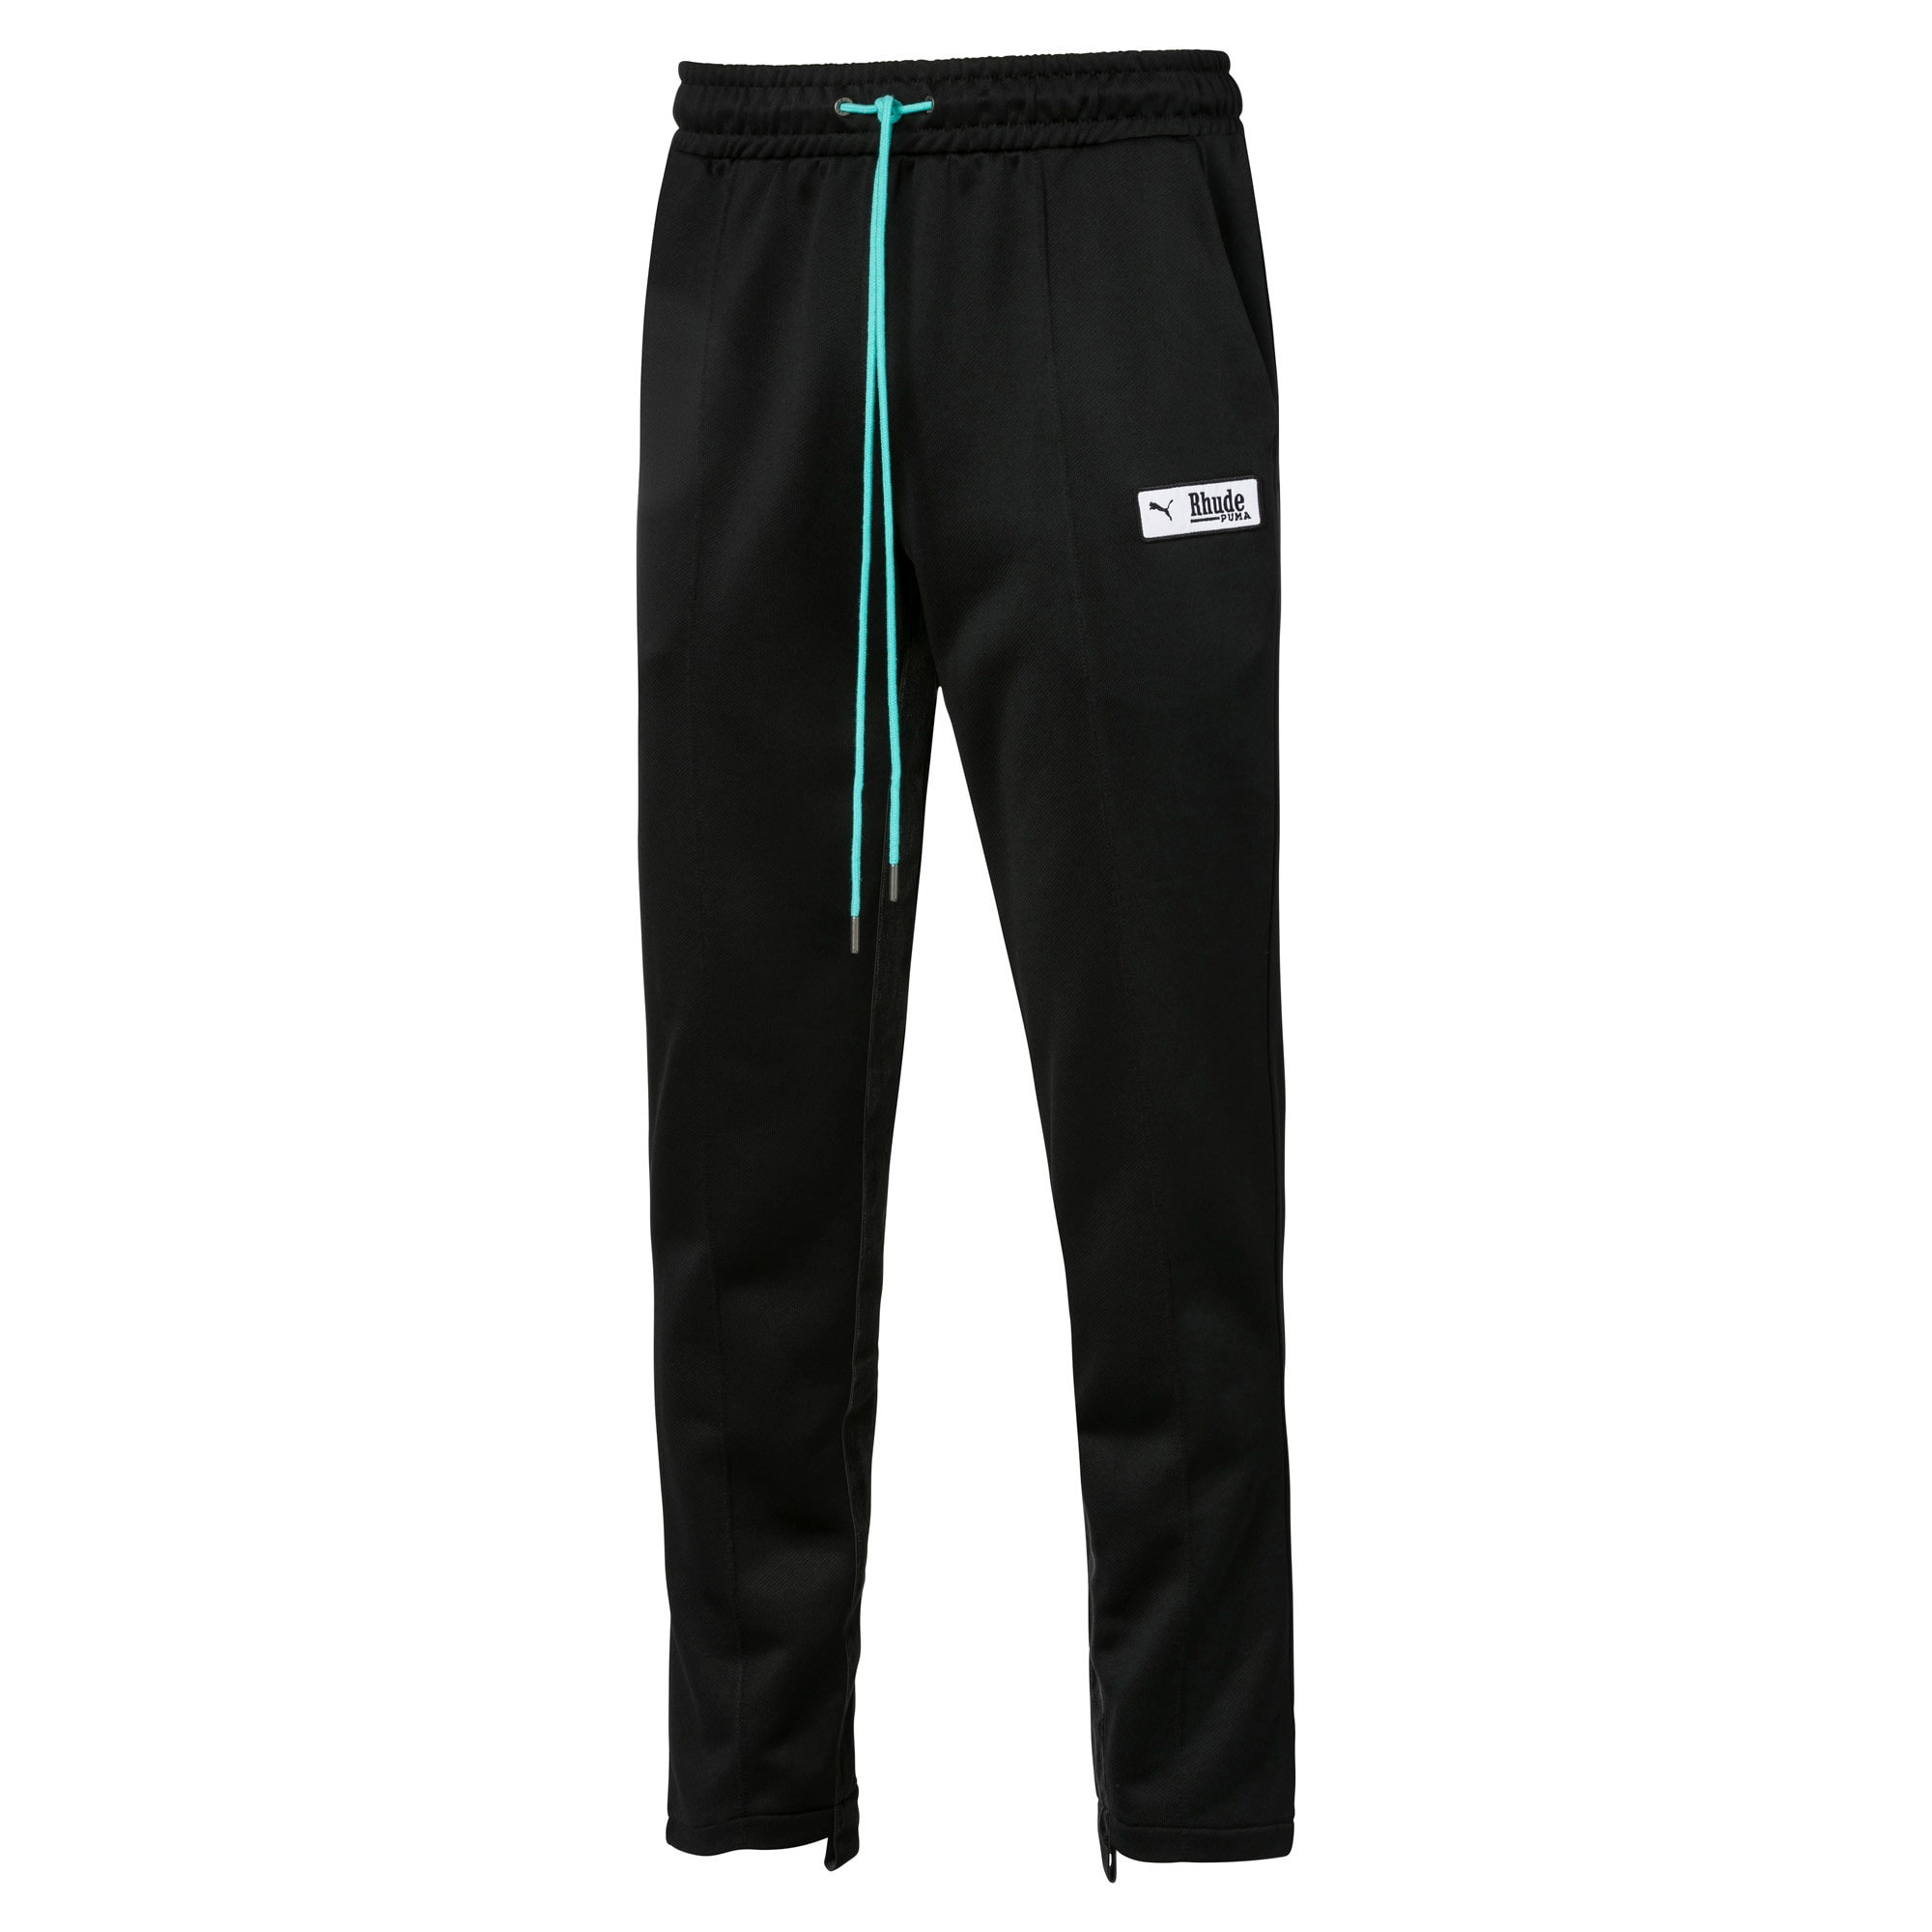 Thumbnail 1 of PUMA x RHUDE Men's Track Pants, Puma Black, medium